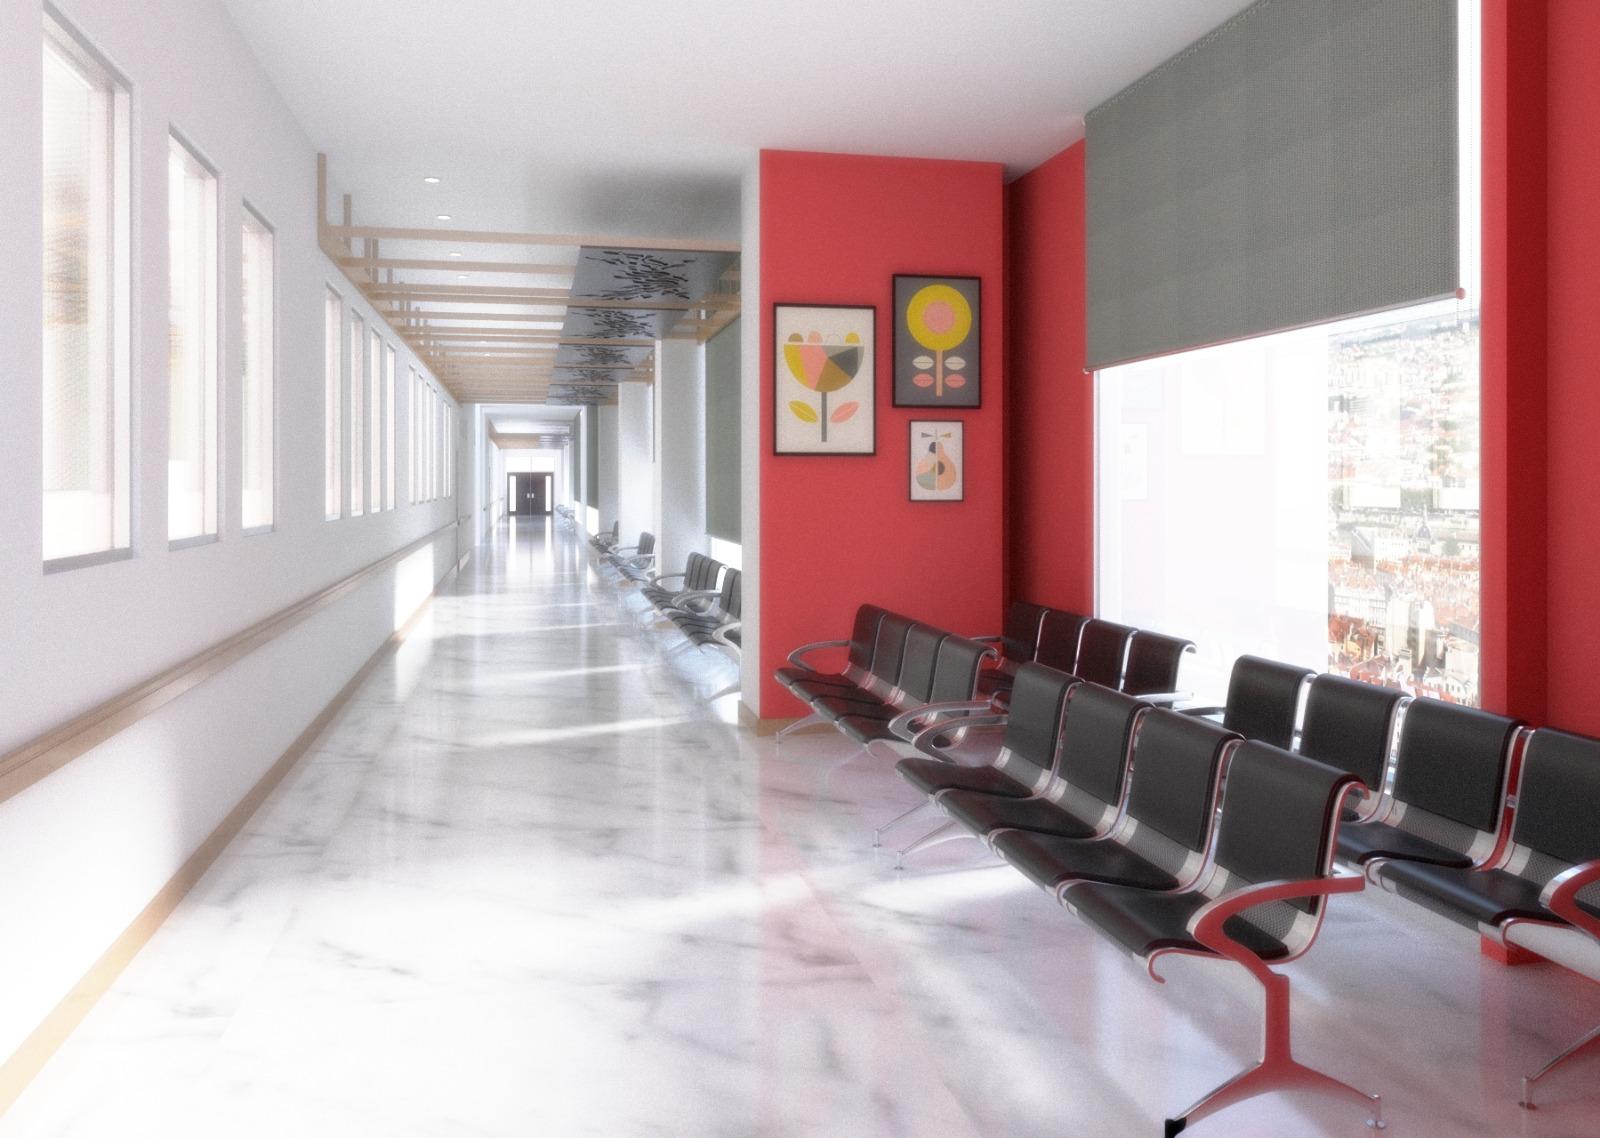 Tfq Architects Desain Interior Ruang Koridor Rumah Sakit Jawa Timur